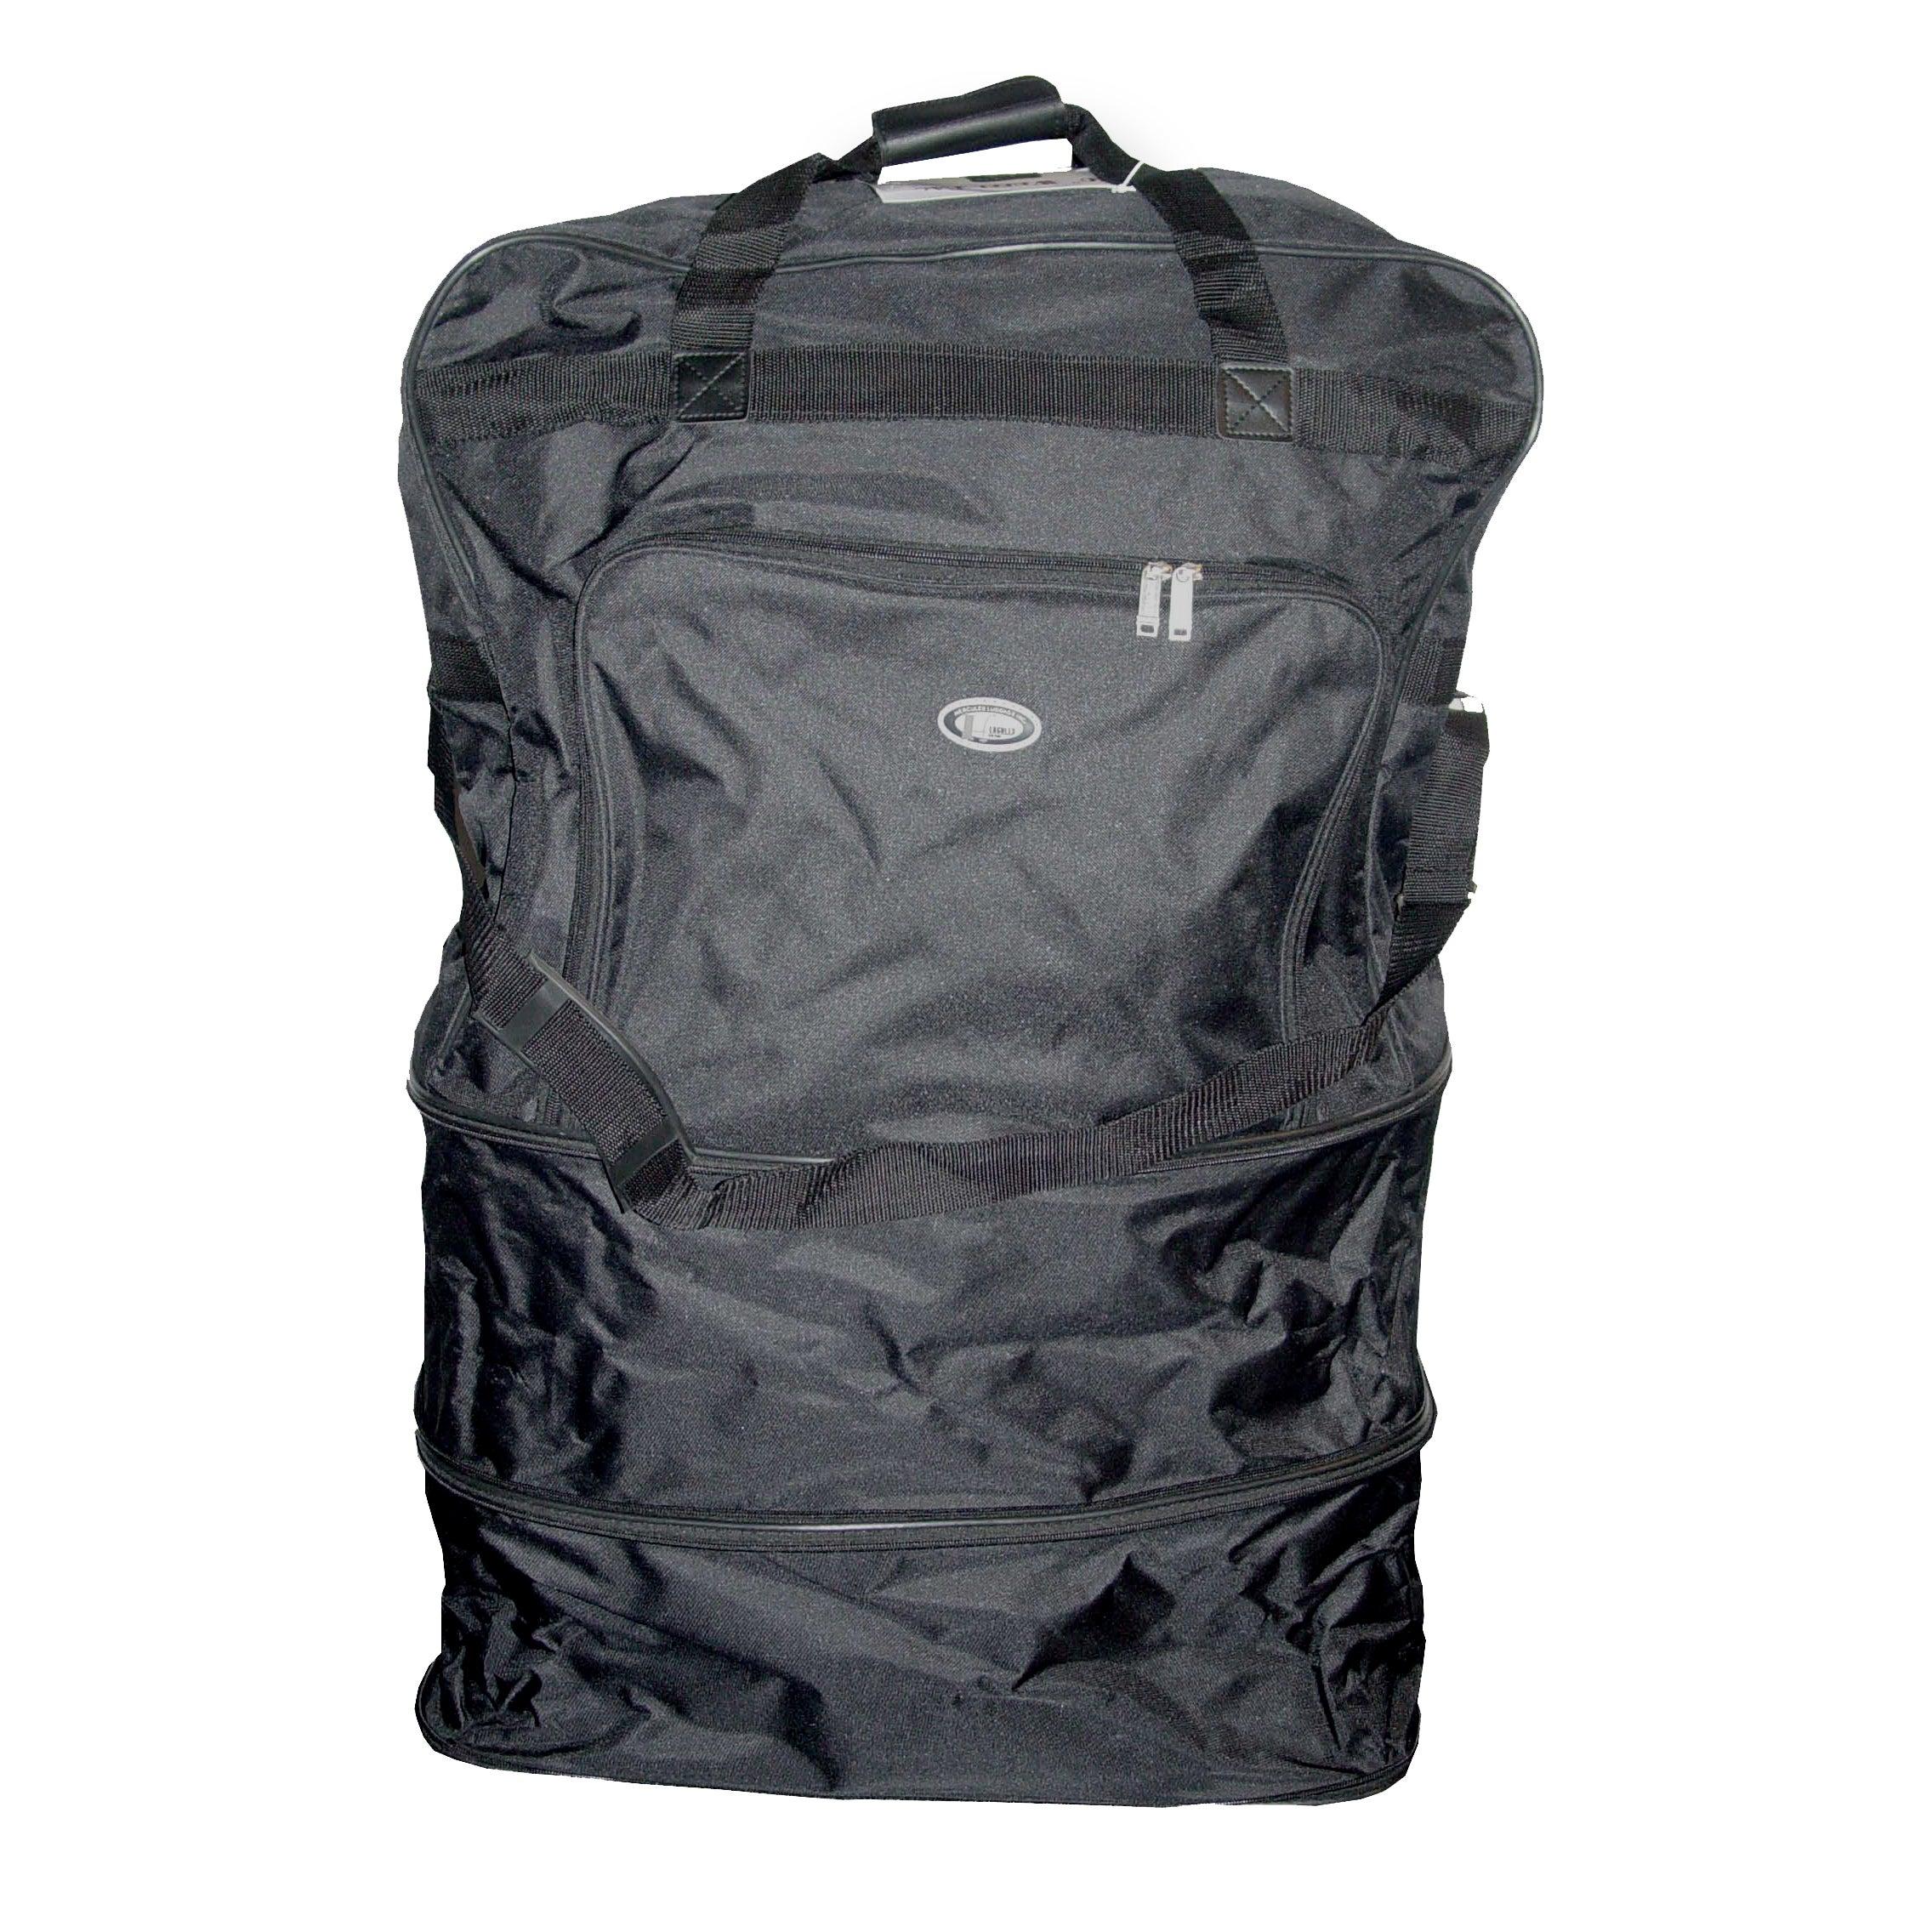 eafc053cbcb0 Shop Black Heavy Duty Polyester 40-inch Wheeled Bag - Free Shipping ...